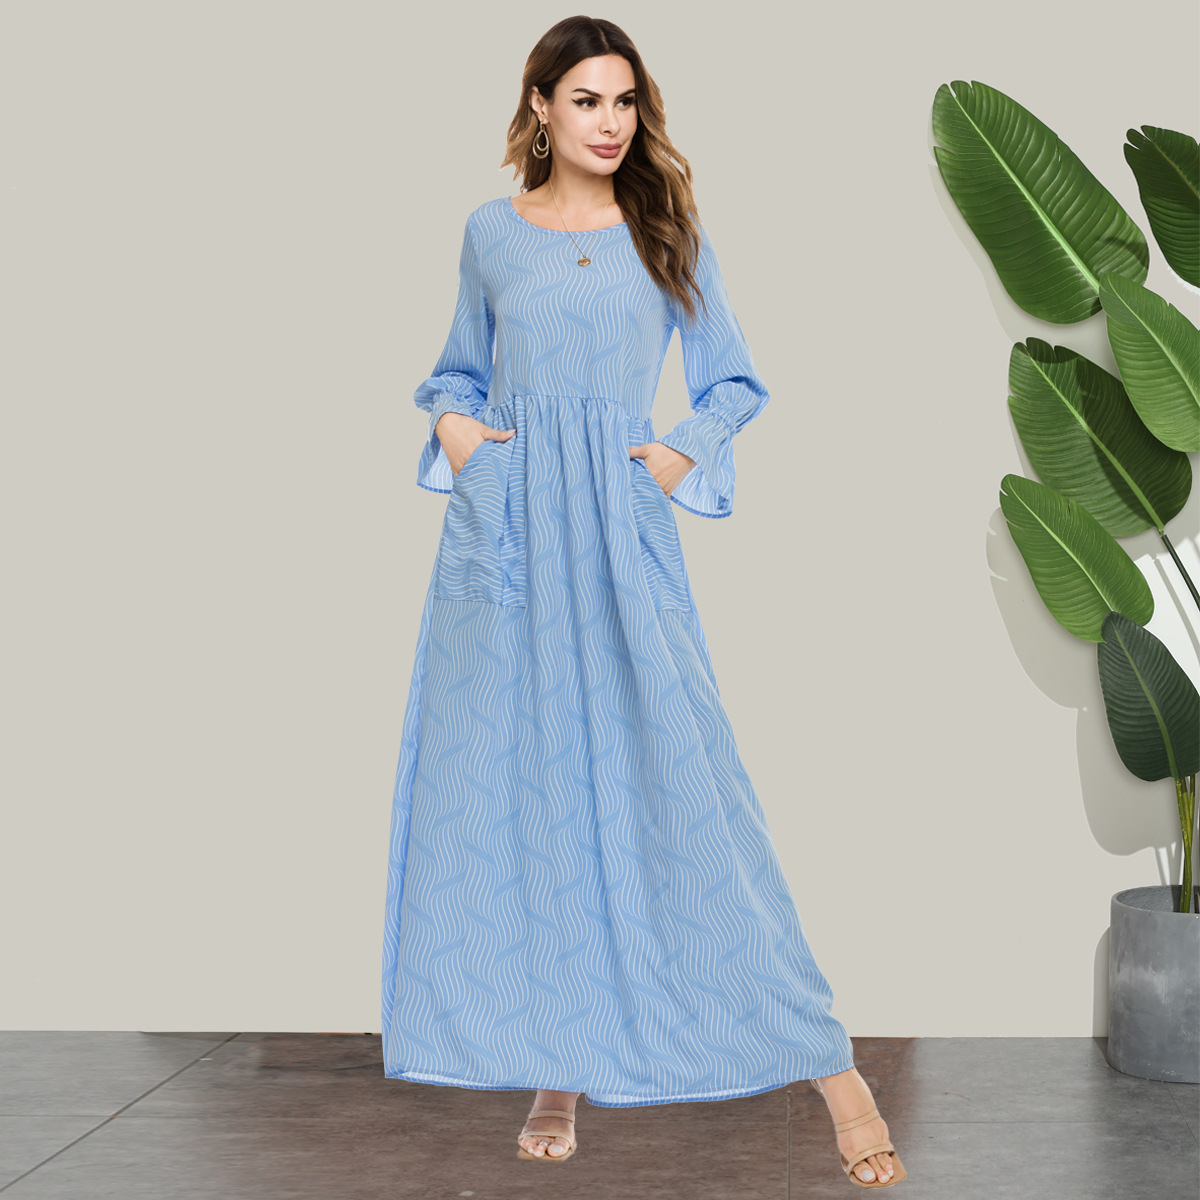 Muslim Women Dress Flare Sleeve Pockets A-line Abaya Dresses Blue UAE Moroccan Kaftan Islamic Clothing Big Swing Plus Size Robe